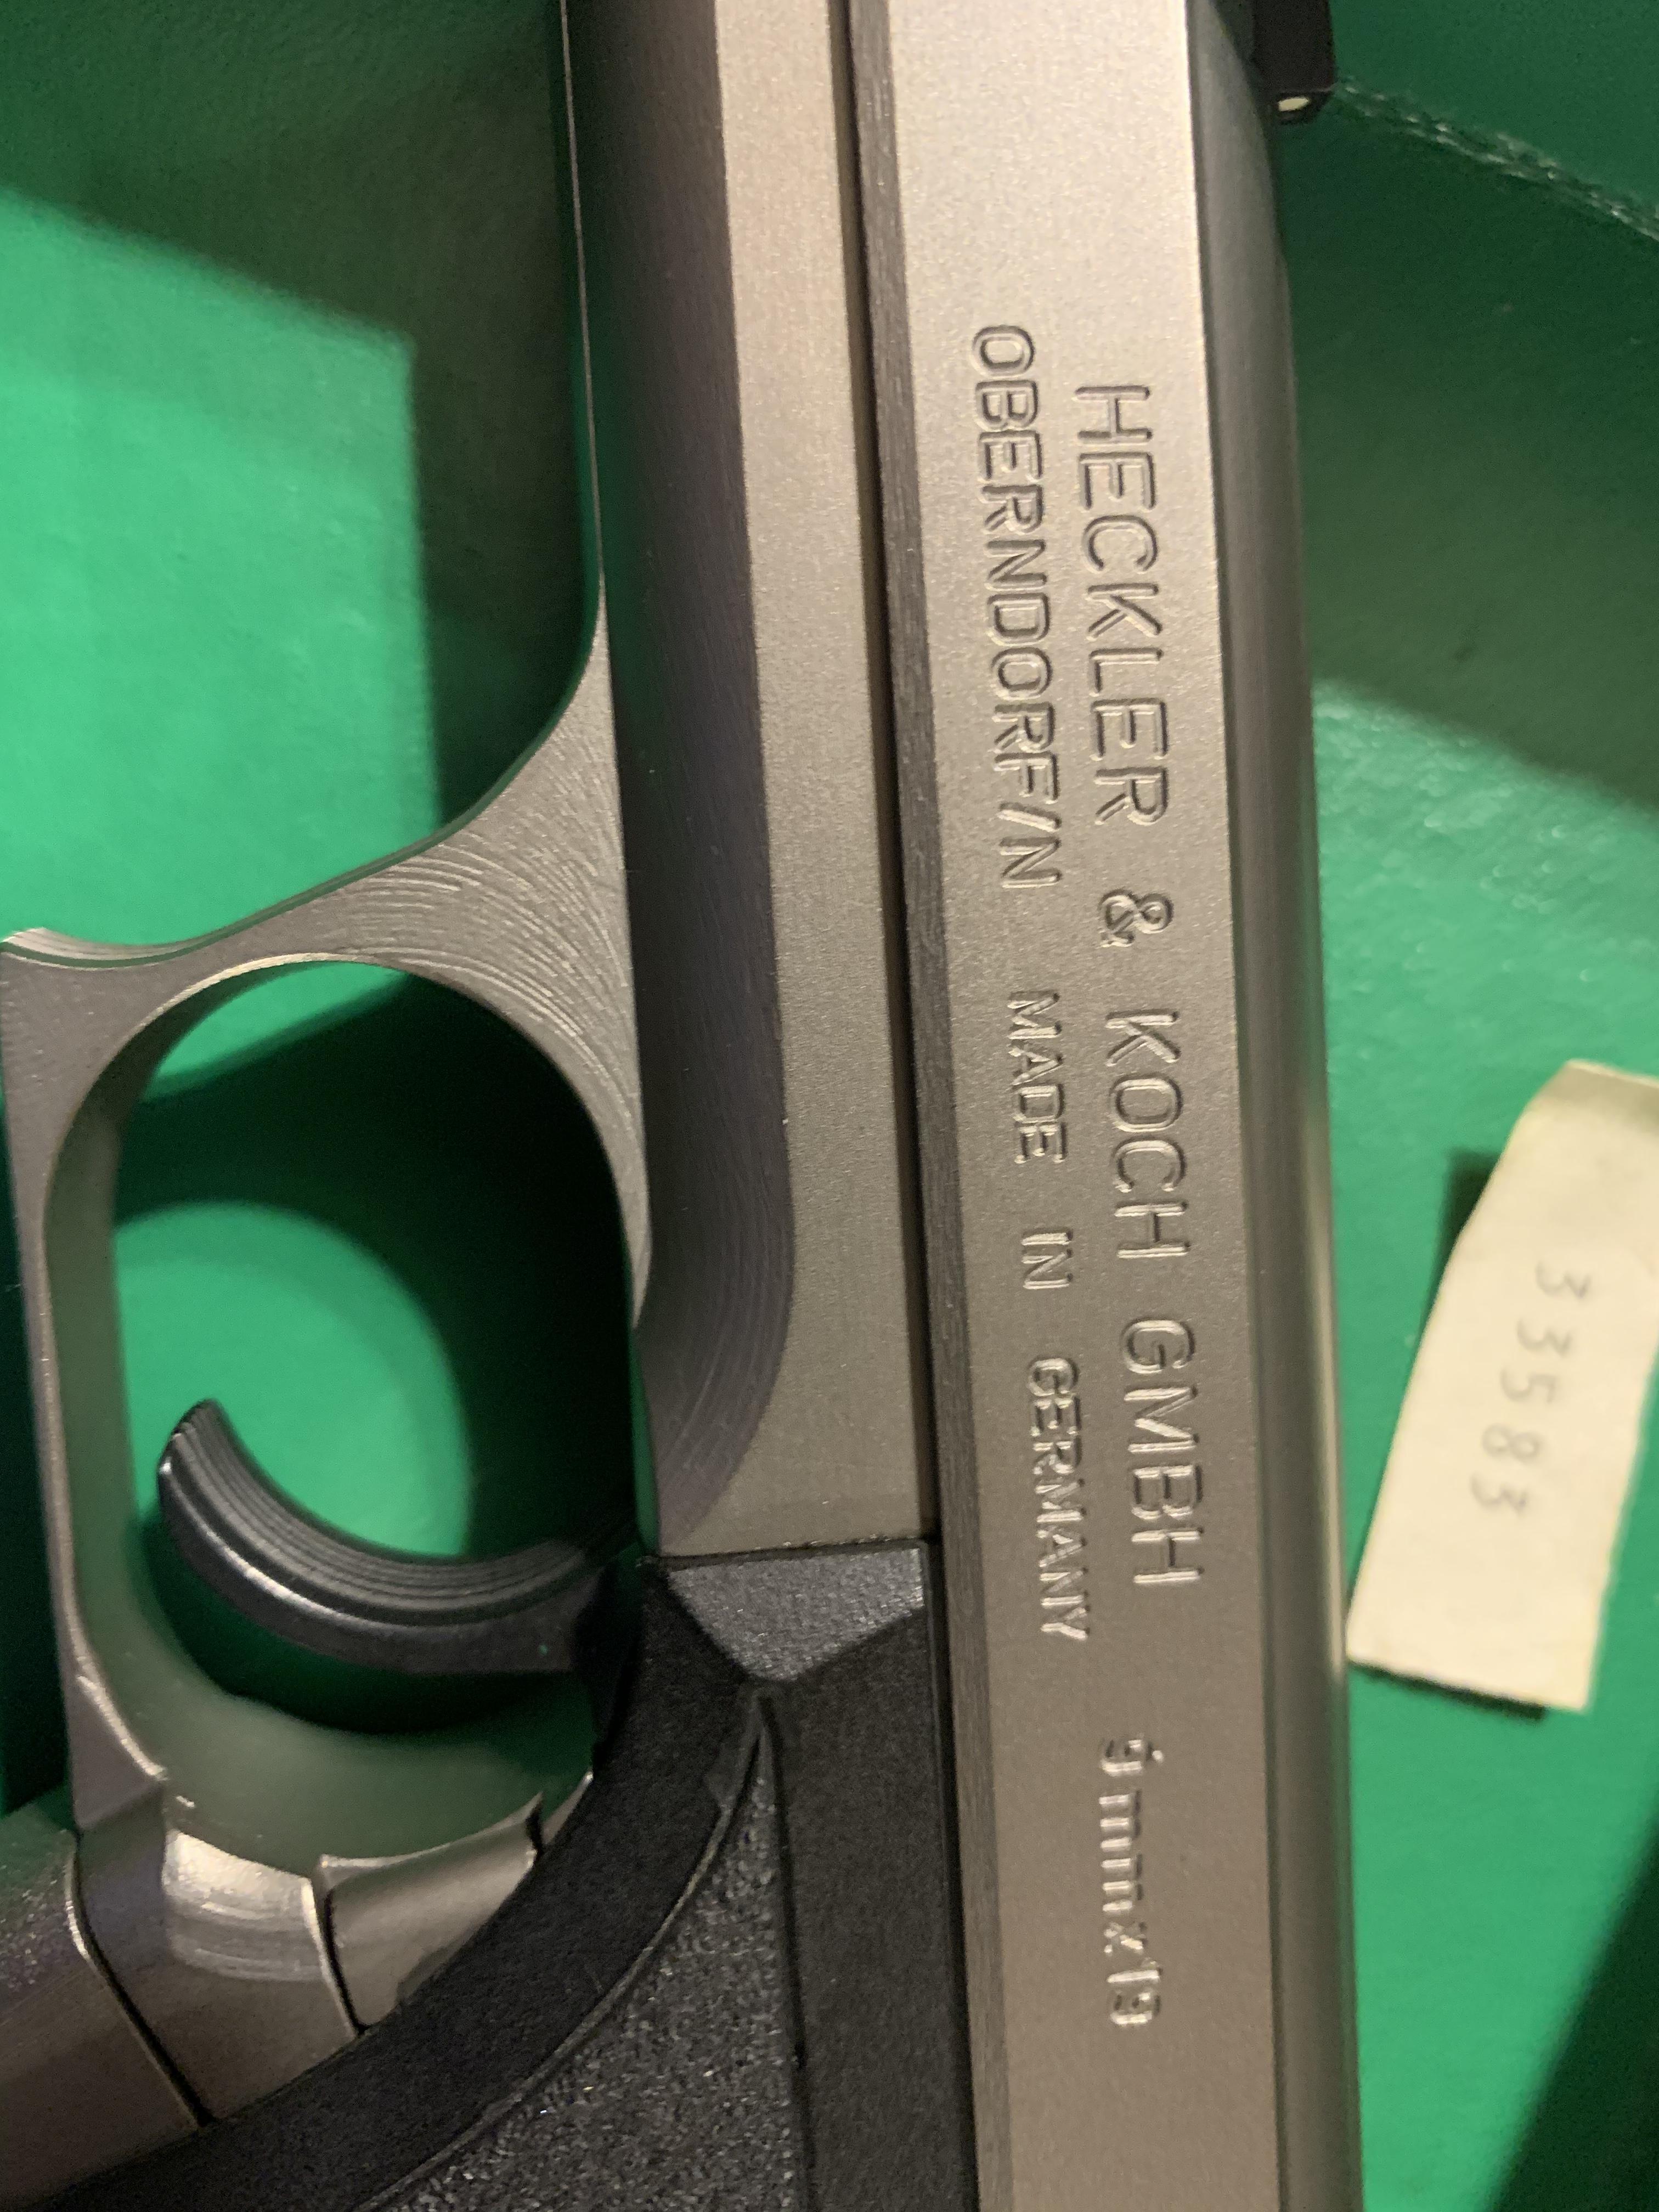 New to me HK P7-00ea0c6d-c444-4d77-b605-eb784782dece_1582251445426.jpeg